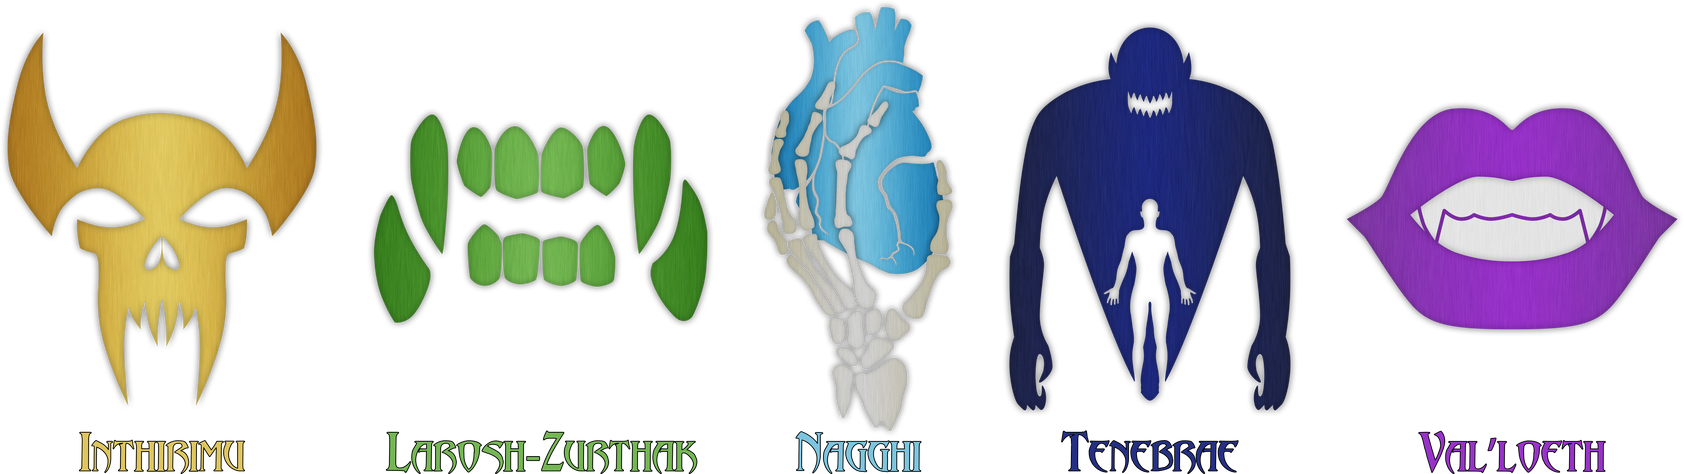 Dungeons and Dragons Vampire Bloodline Symbols